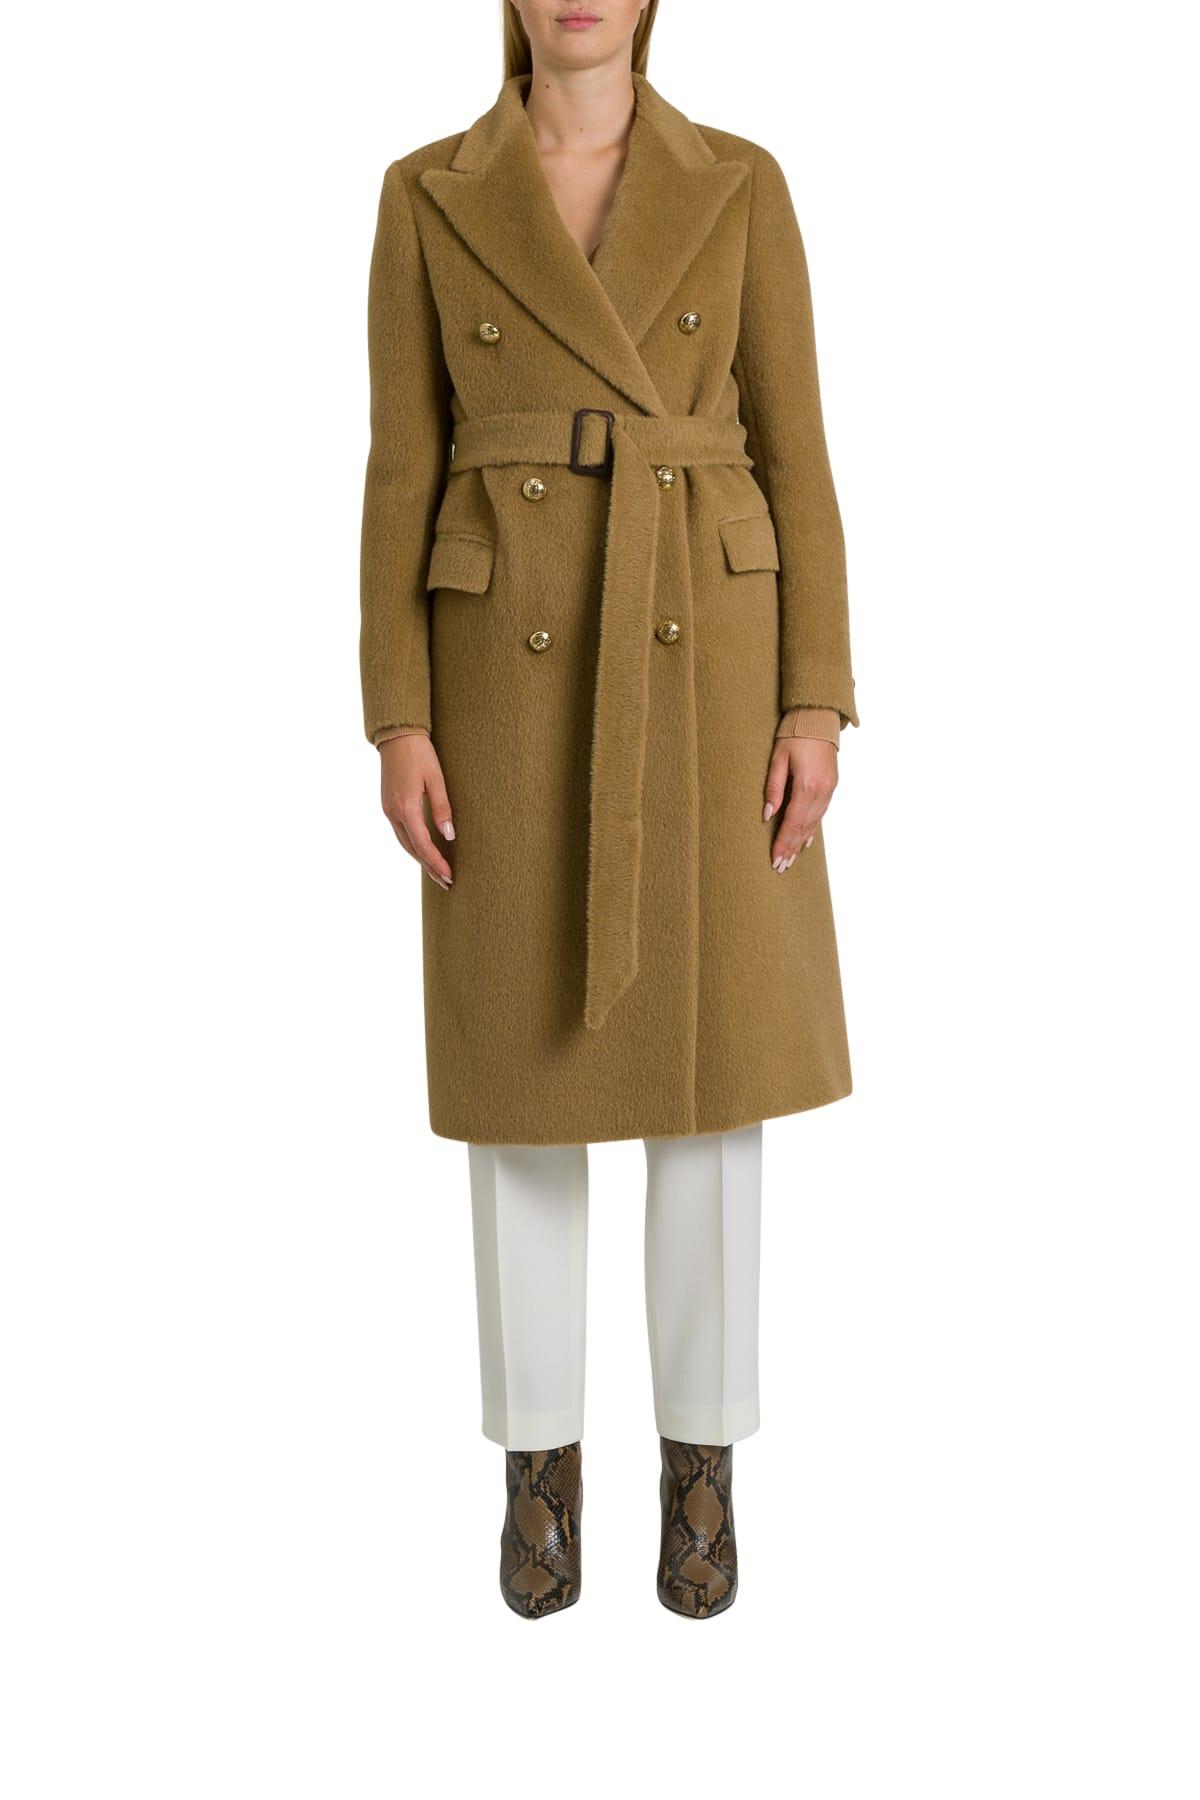 Tagliatore Jole Double-breatsed Coat